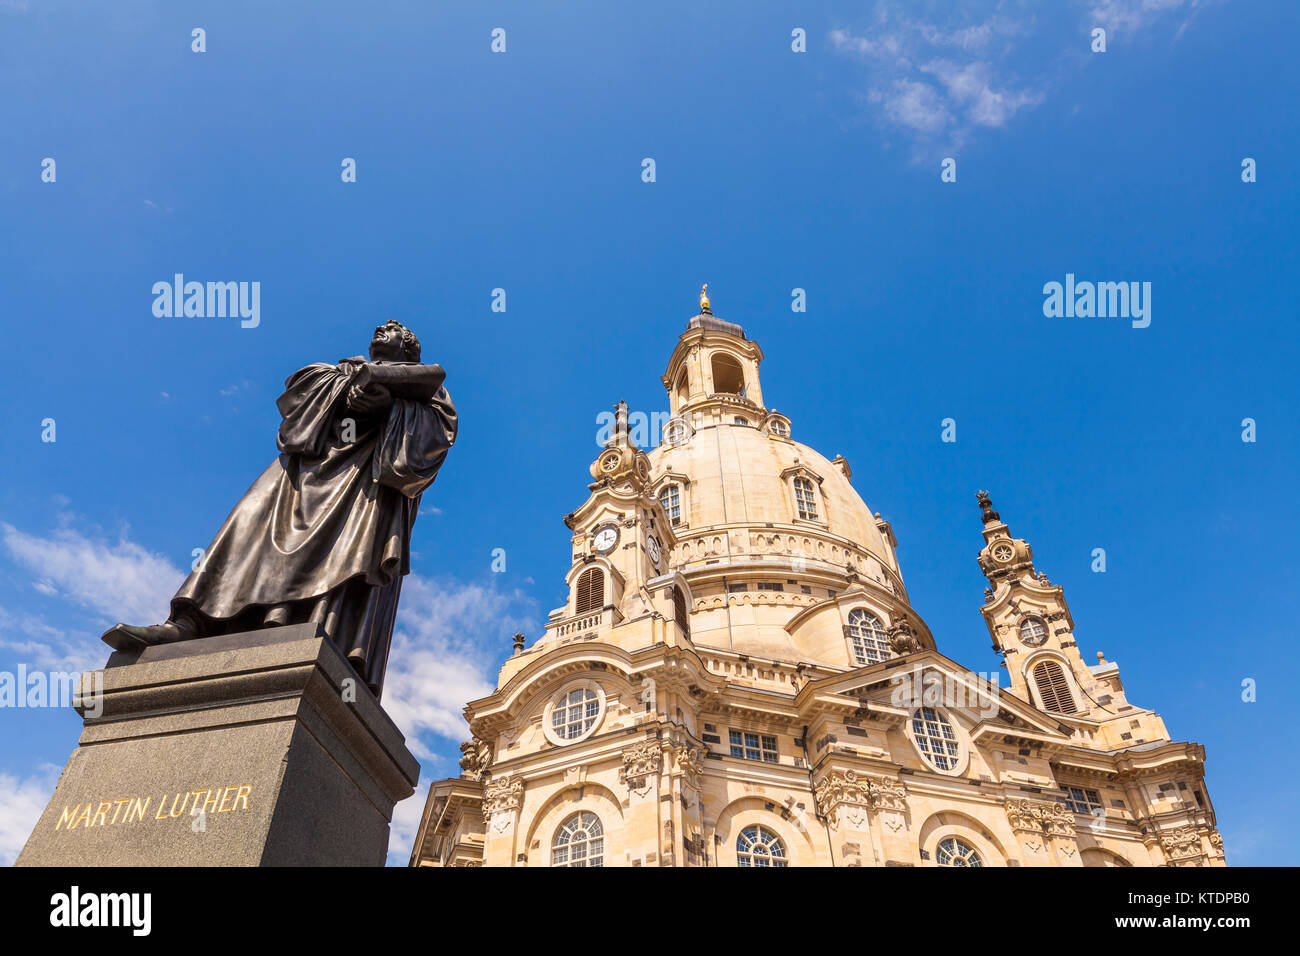 Deutschland, Sachsen, Dresden, Neumarkt, Standbild Martin Luther, Luther-Denkmal, Frauenkirche, Kuppel - Stock Image